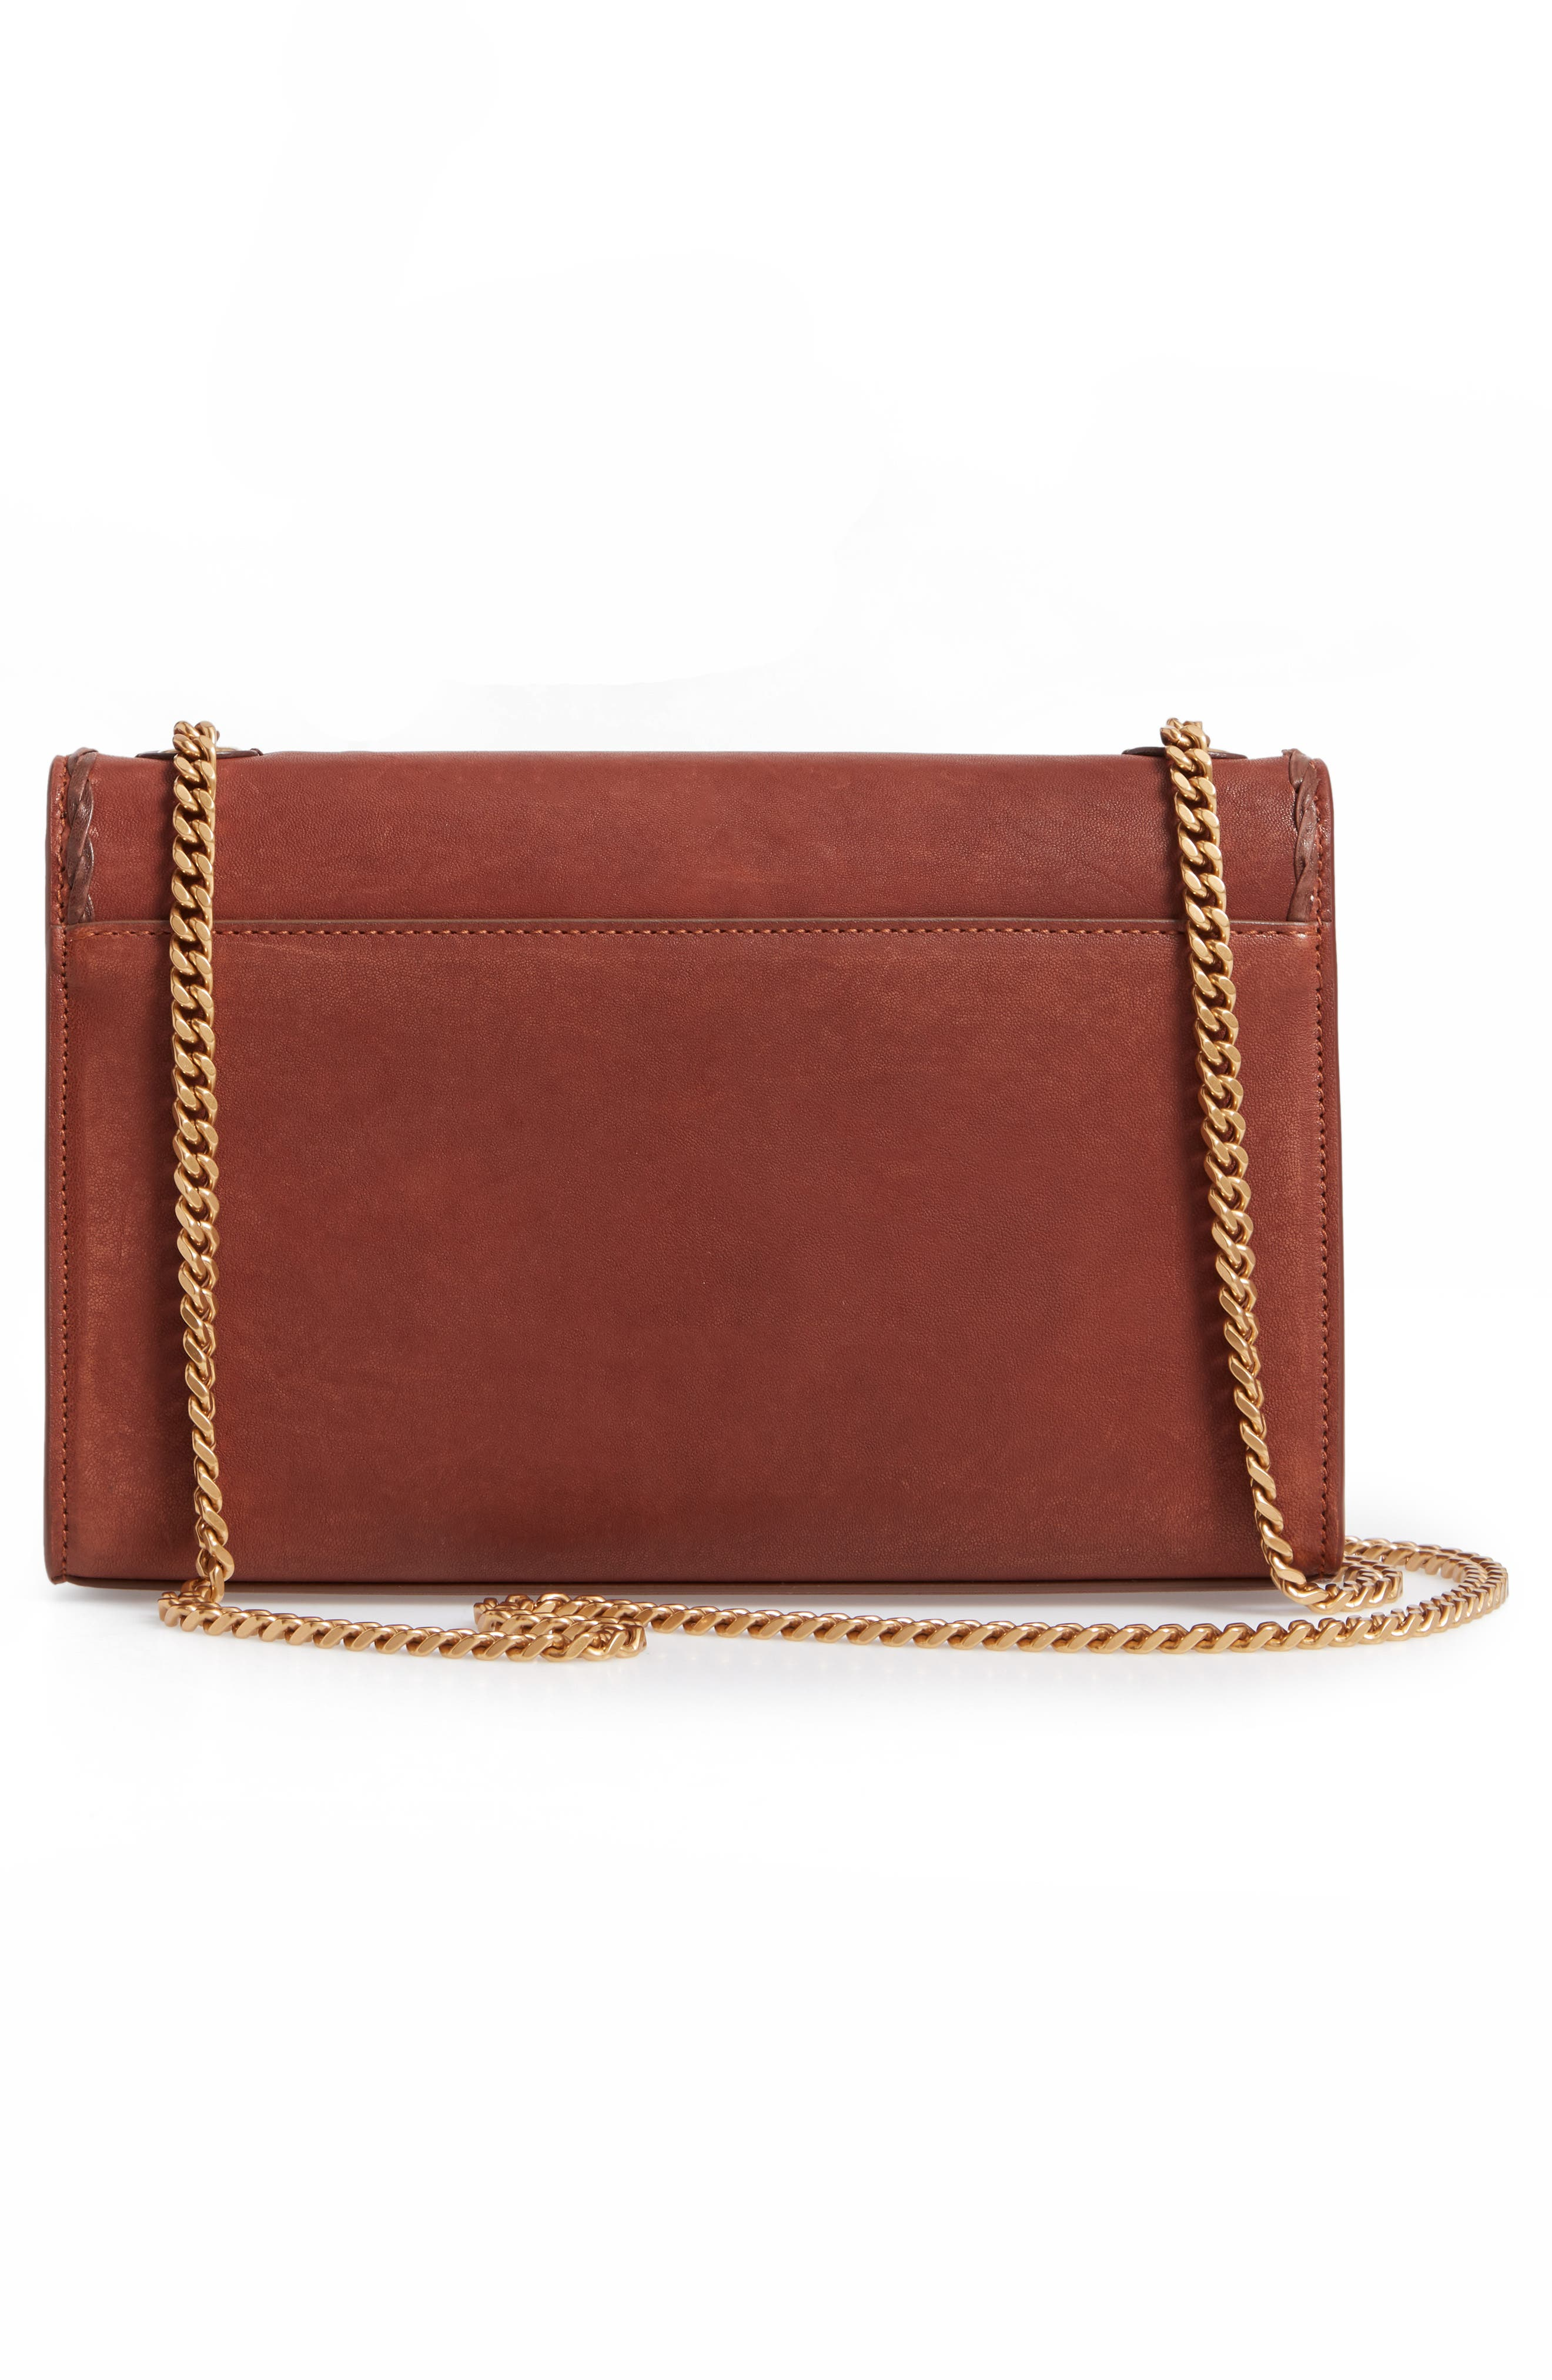 Medium Kate Studded Leather Crossbody Bag,                             Alternate thumbnail 3, color,                             BROWN MULTI